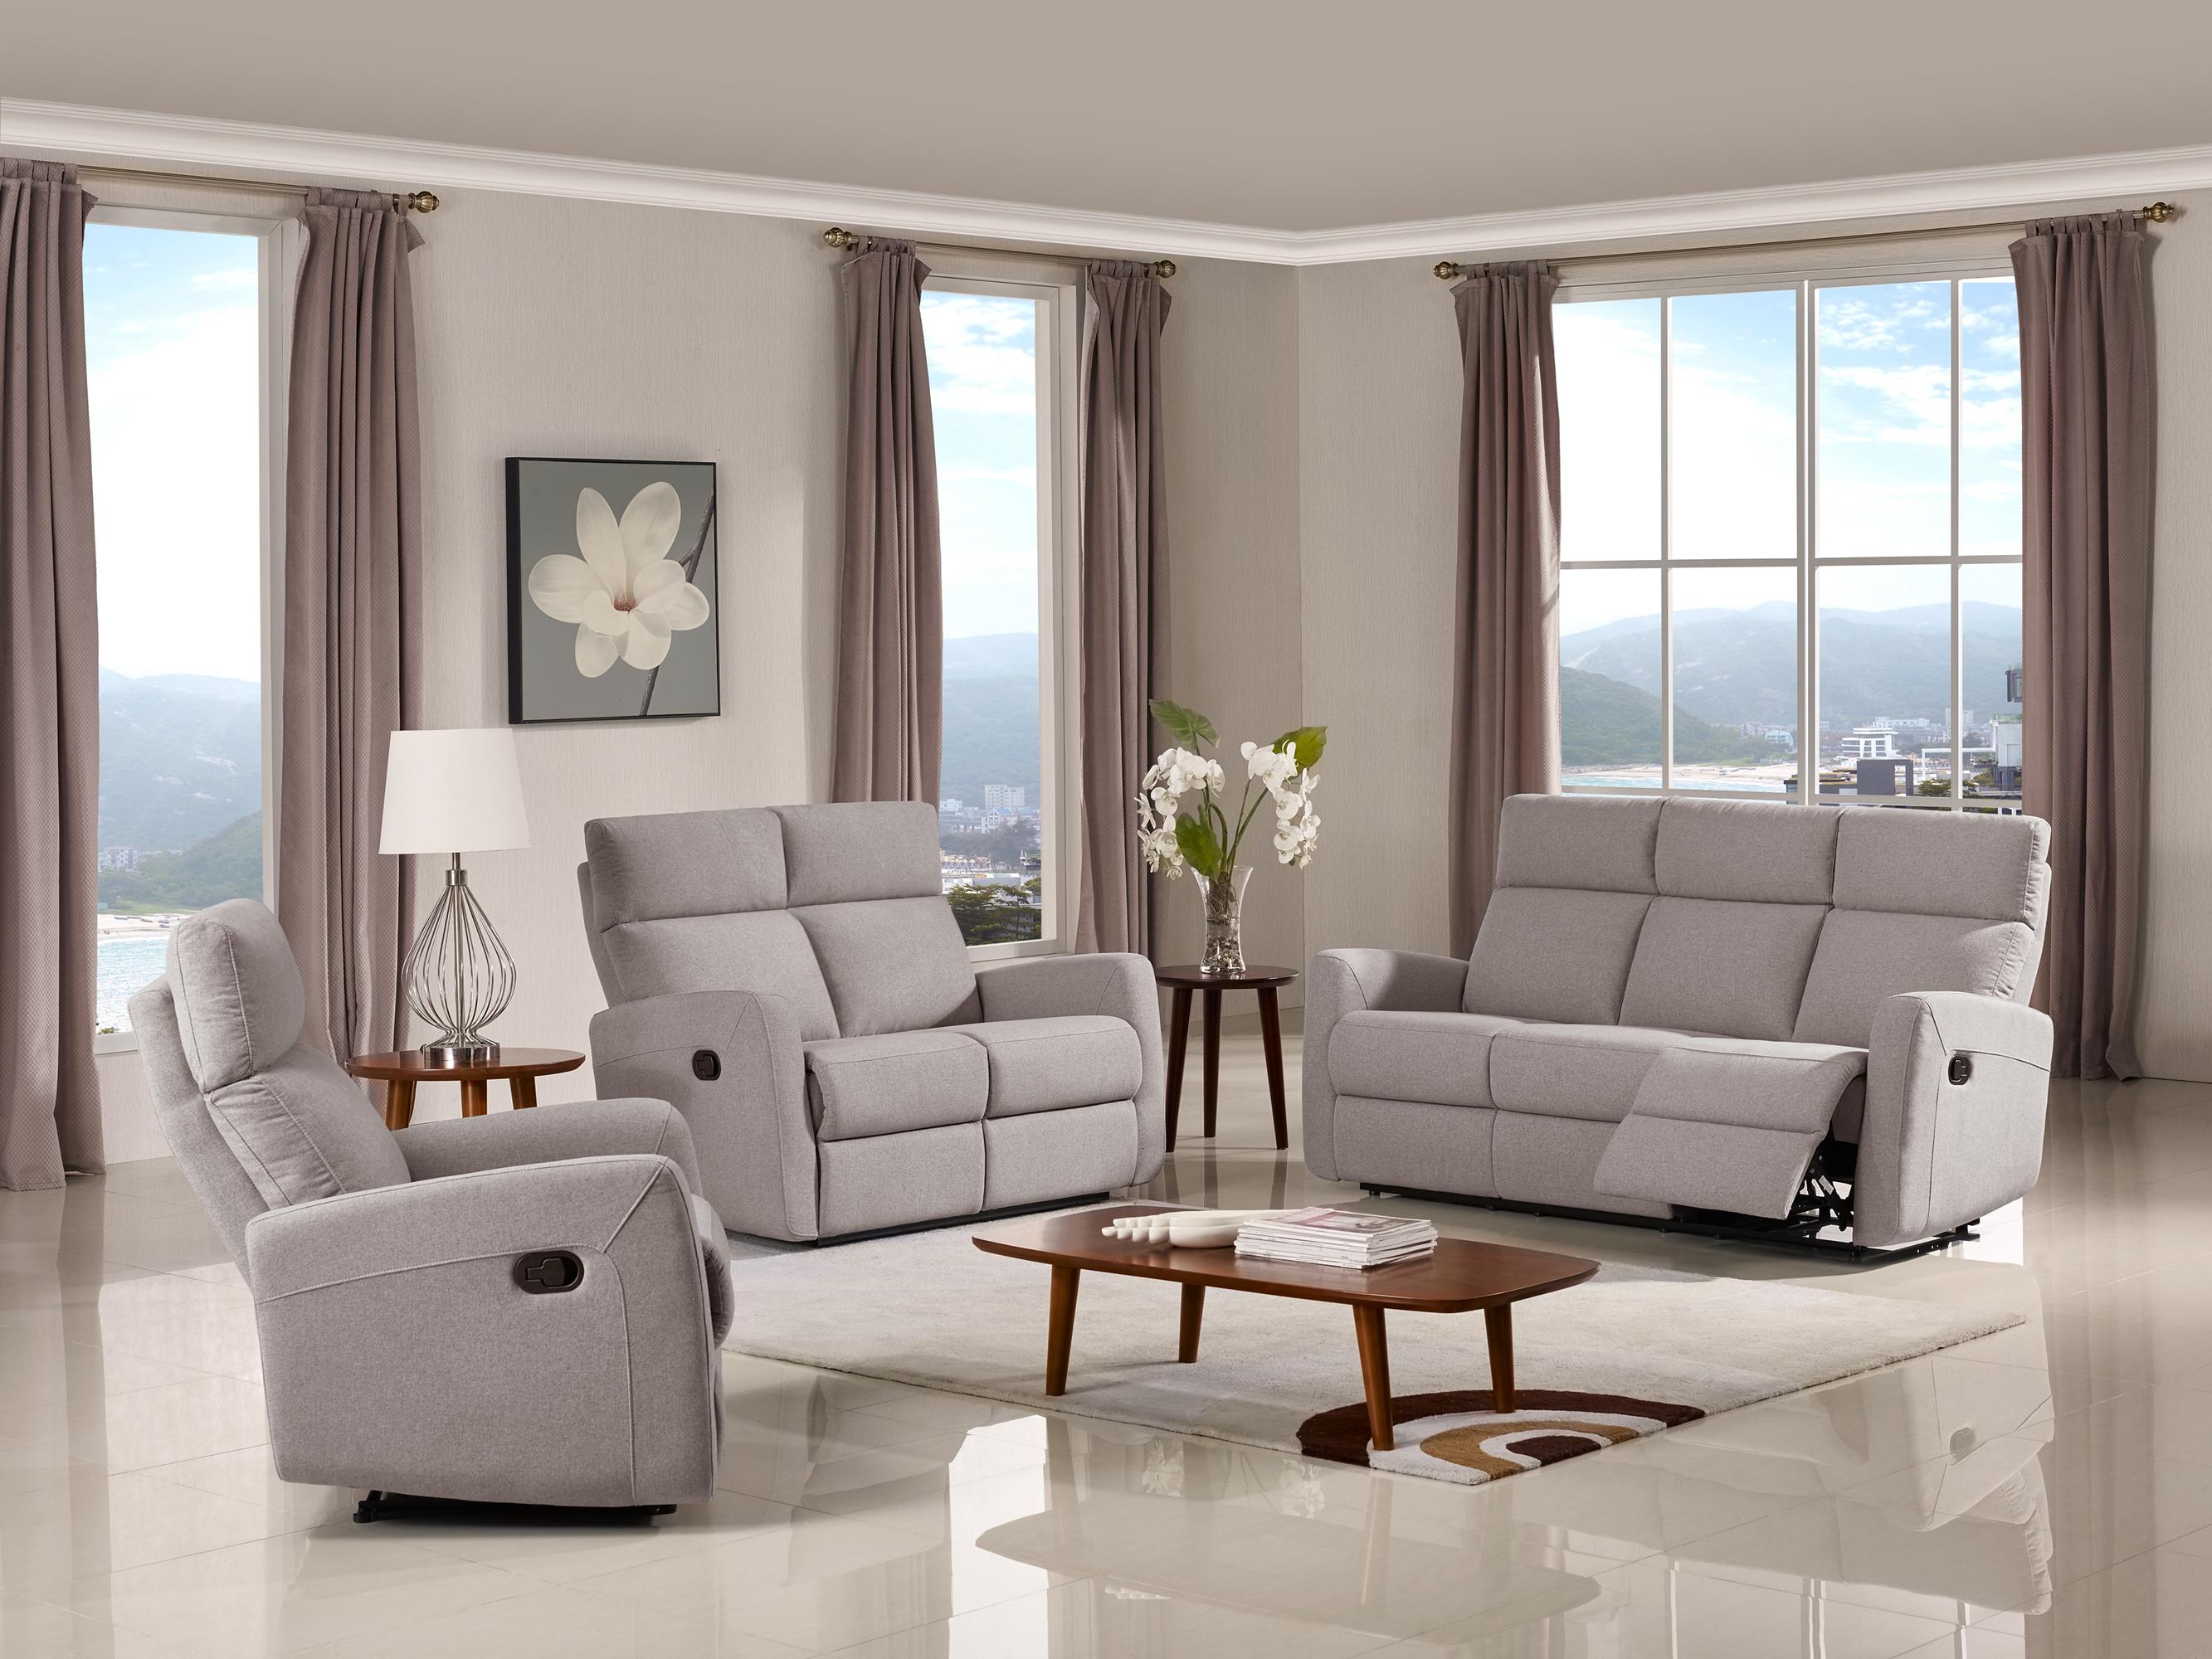 HR045LG (K30) Husky Victoria Reclining Sofa Set Light Gray